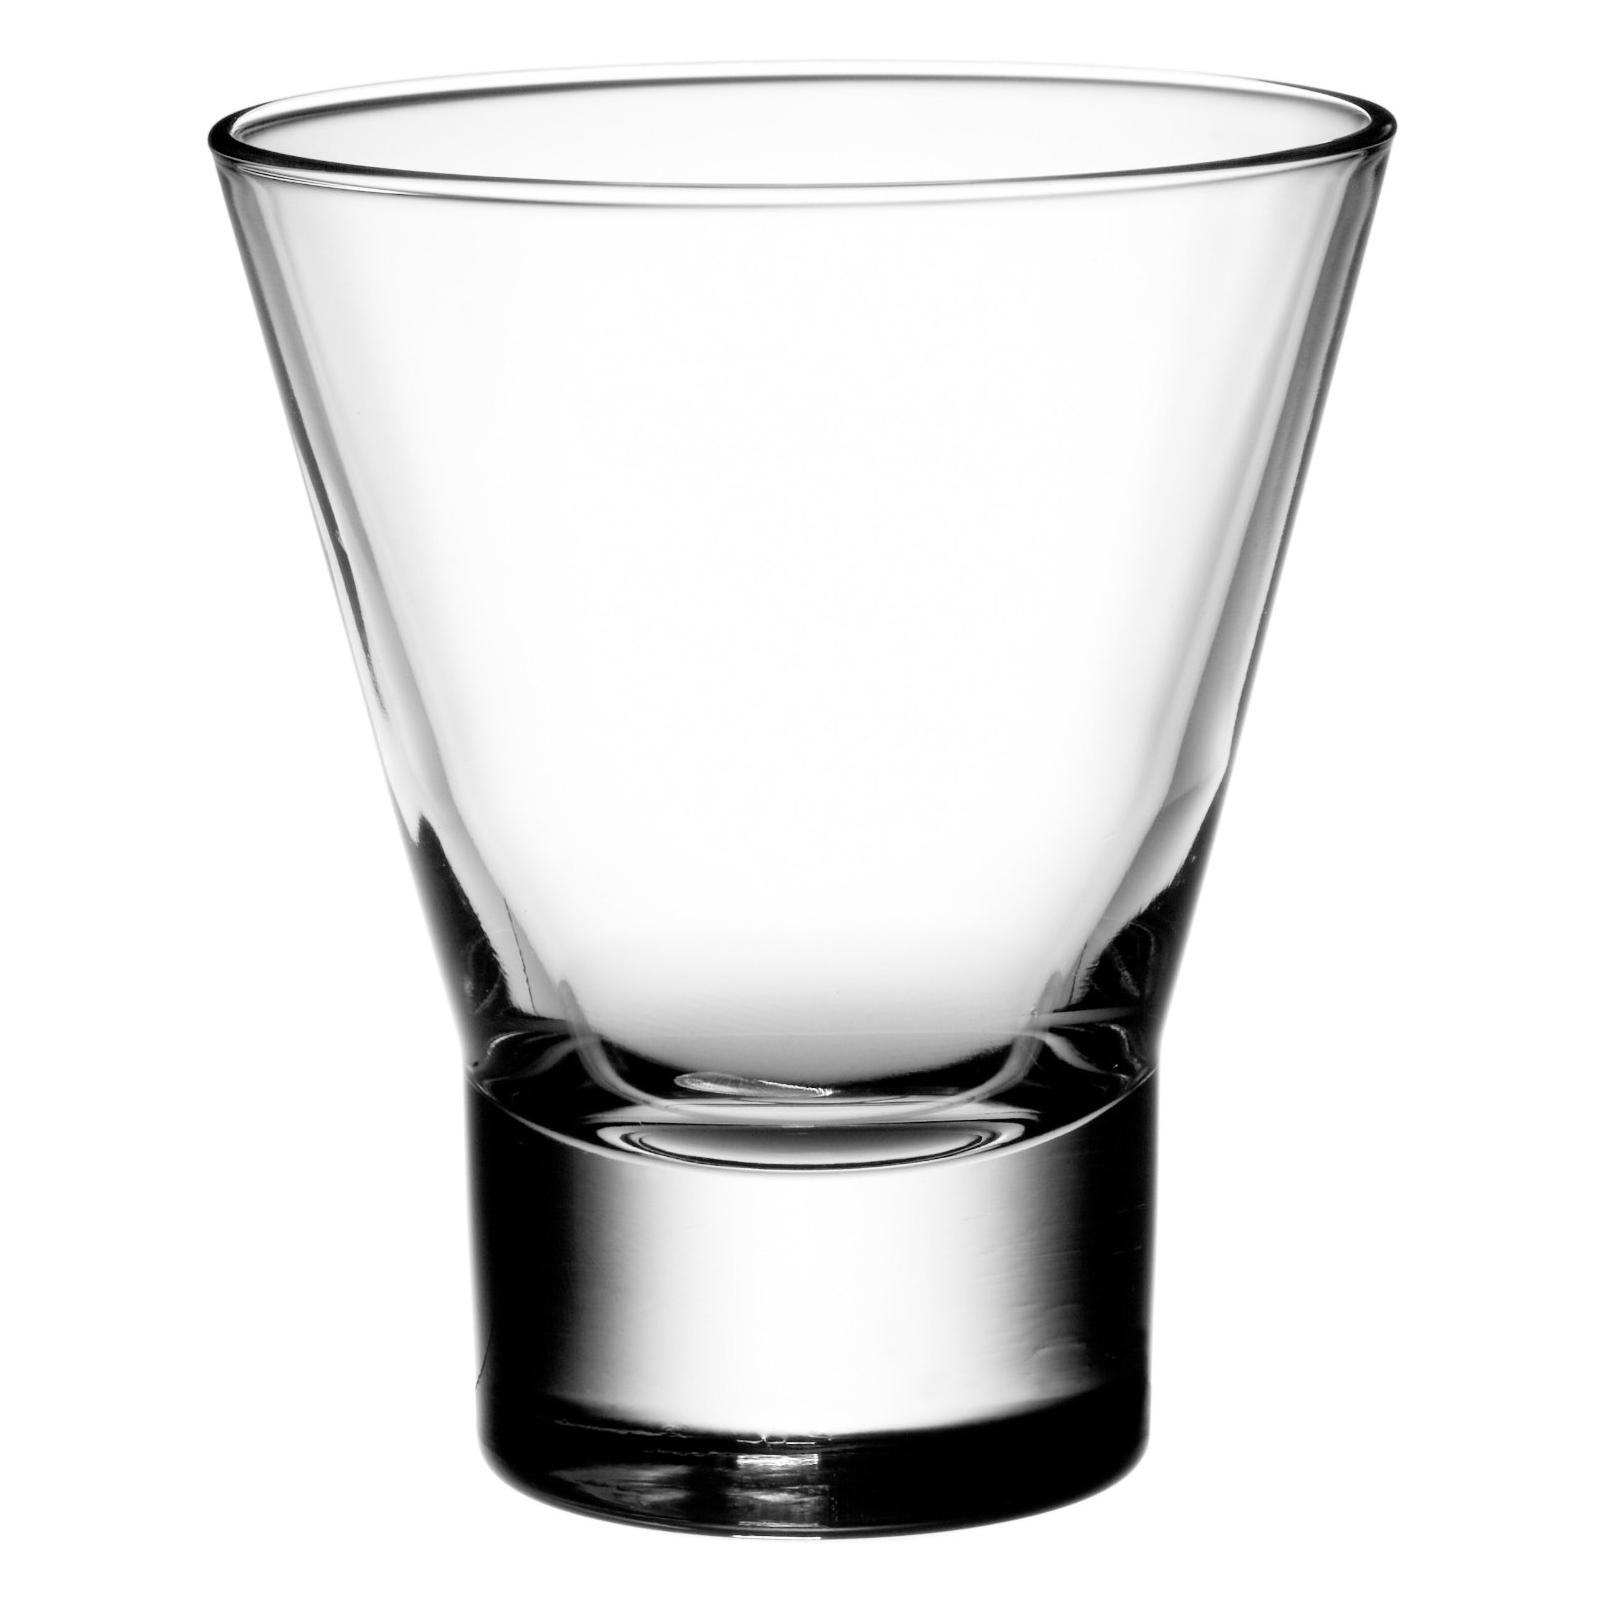 Bormioli Rocco Ypsilon 8.5 Ounce Rocks Glass, Set of 4